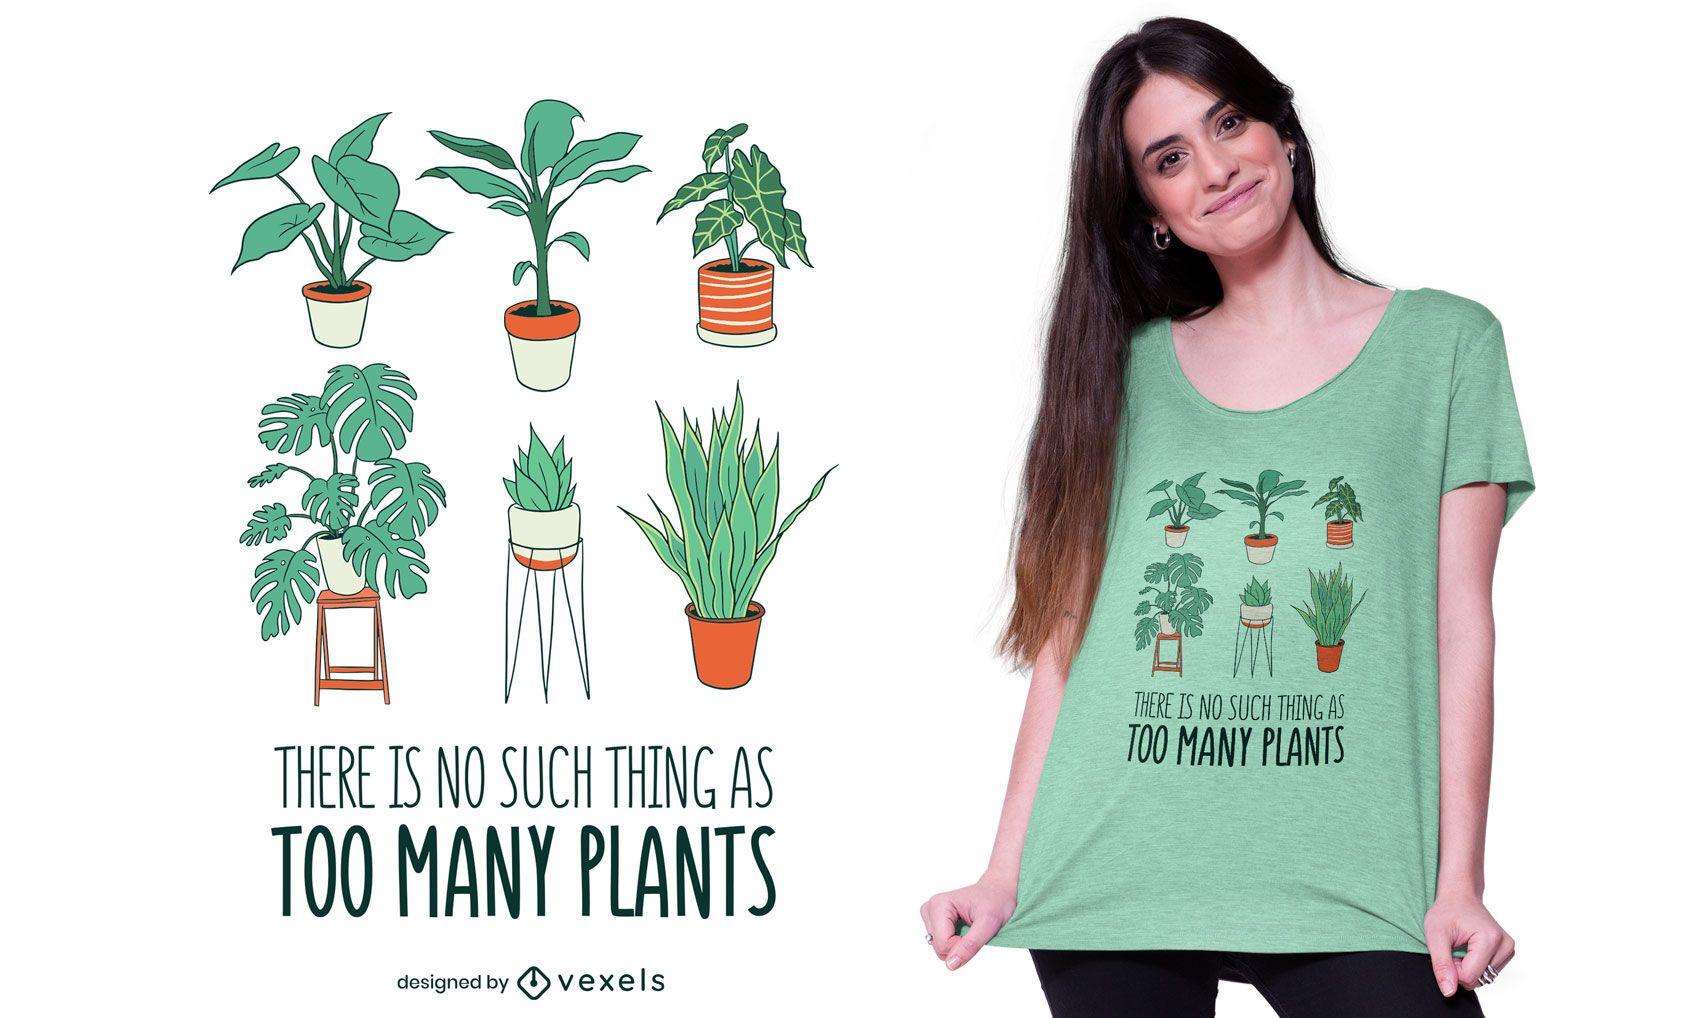 Too many plants t-shirt design